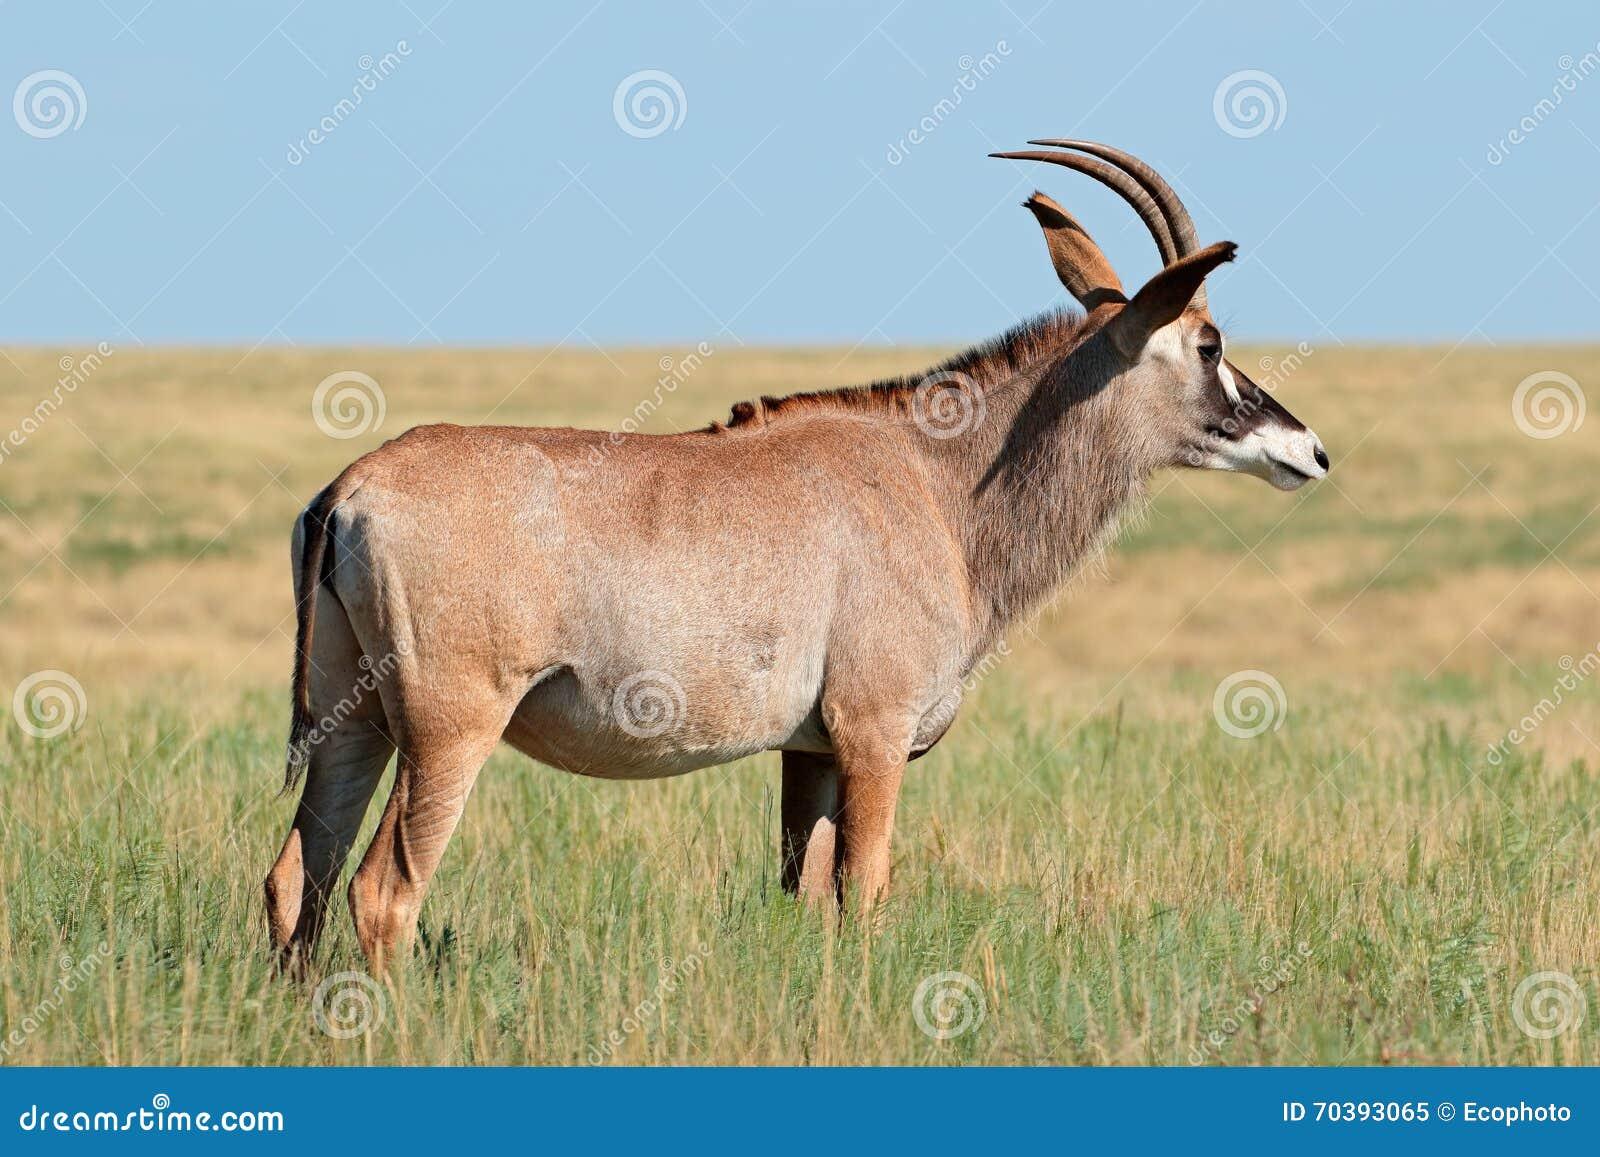 roan antelope stock photo   image 70393065